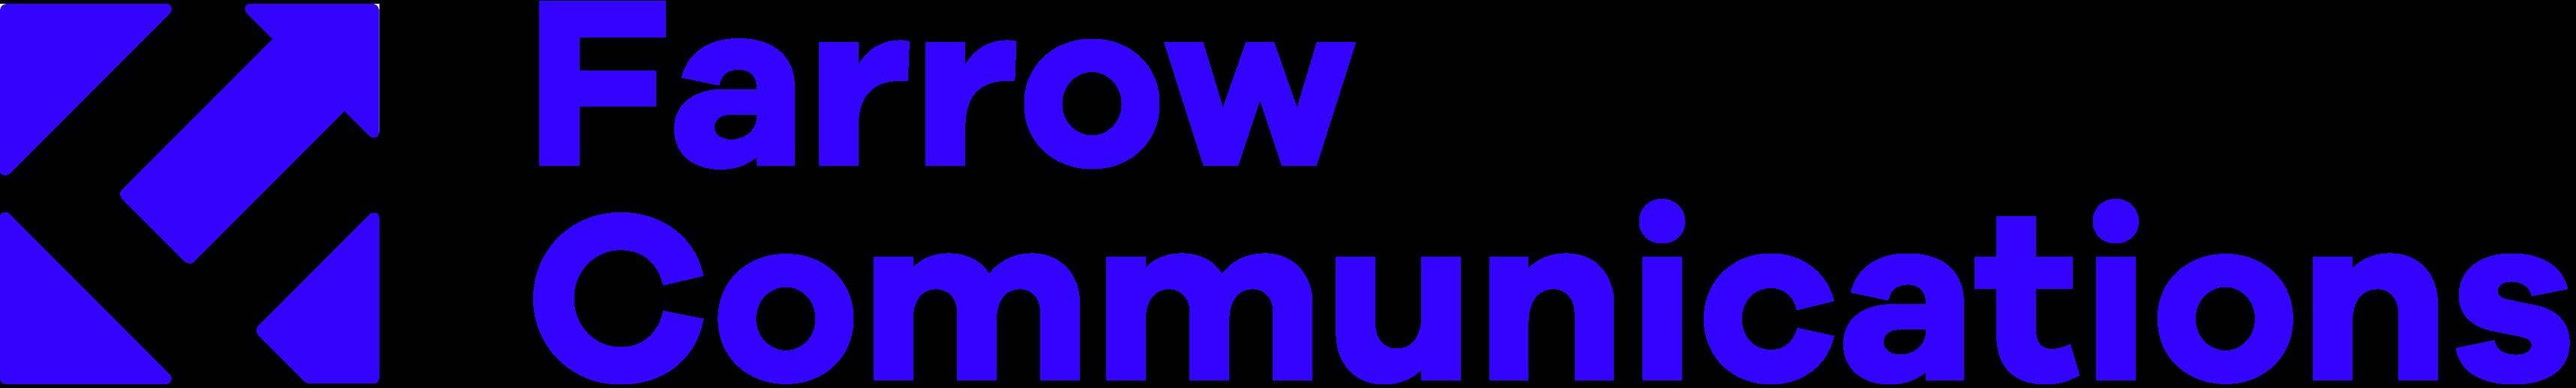 Farrow Communications